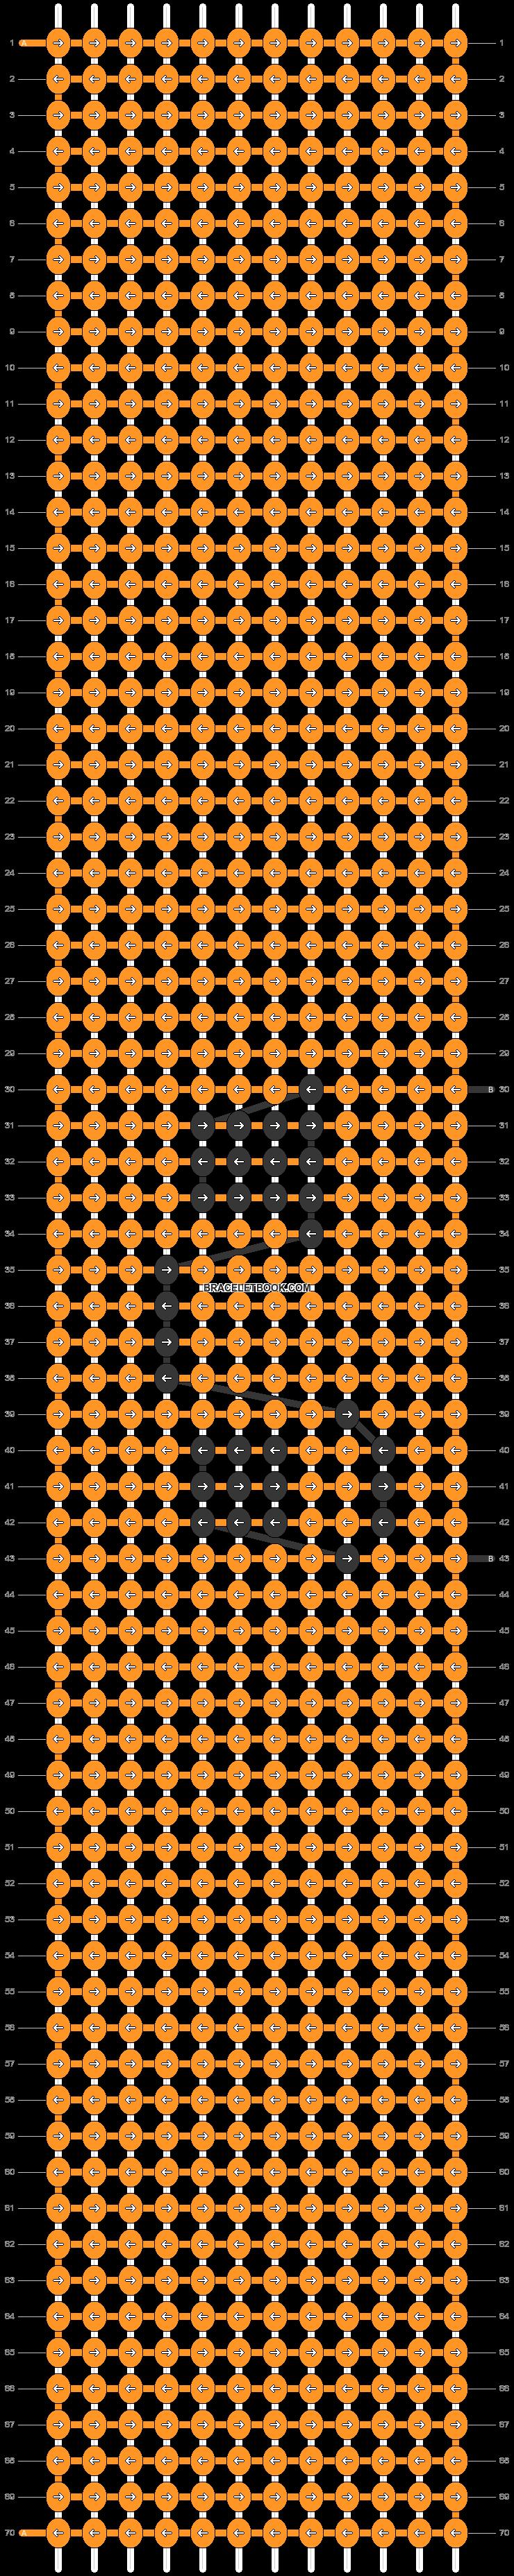 Alpha pattern #47079 pattern